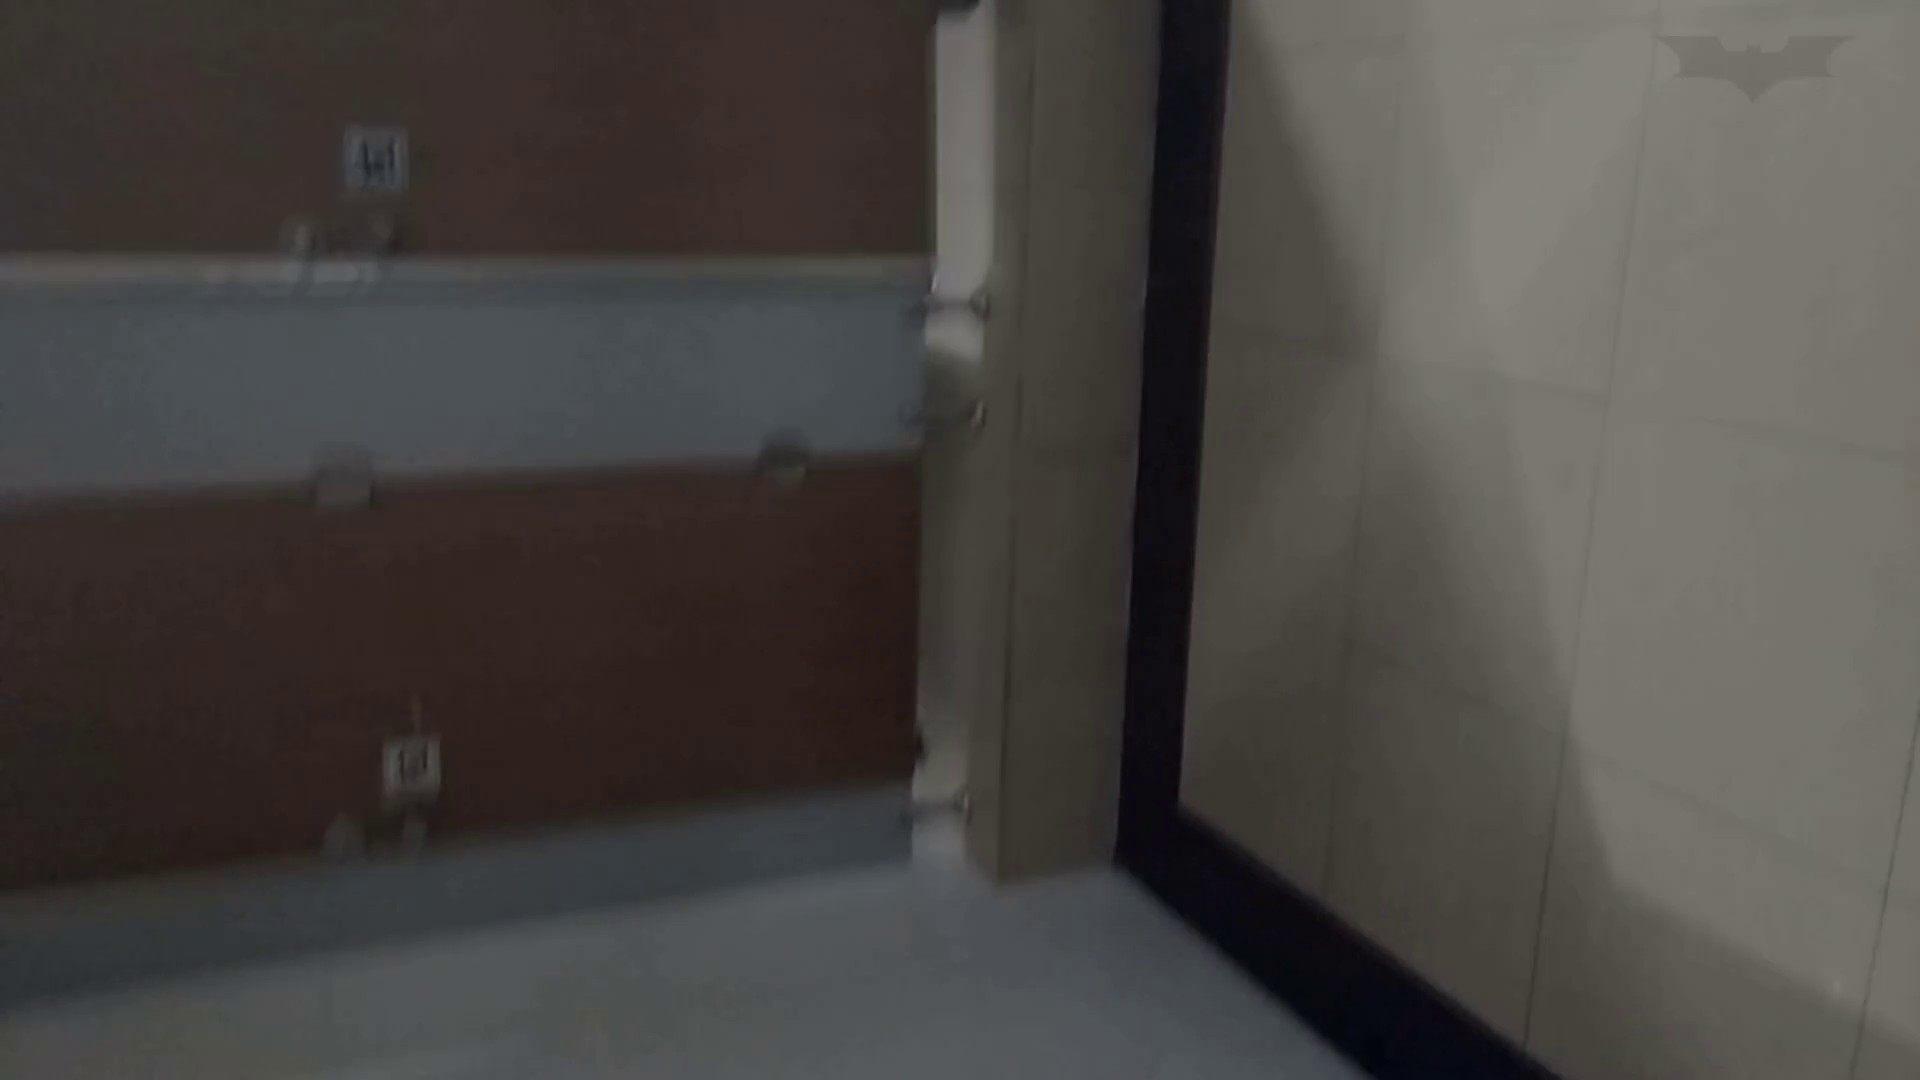 芸術大学ガチ潜入盗撮 JD盗撮 美女の洗面所の秘密 Vol.98 丸見え 性交動画流出 48画像 39